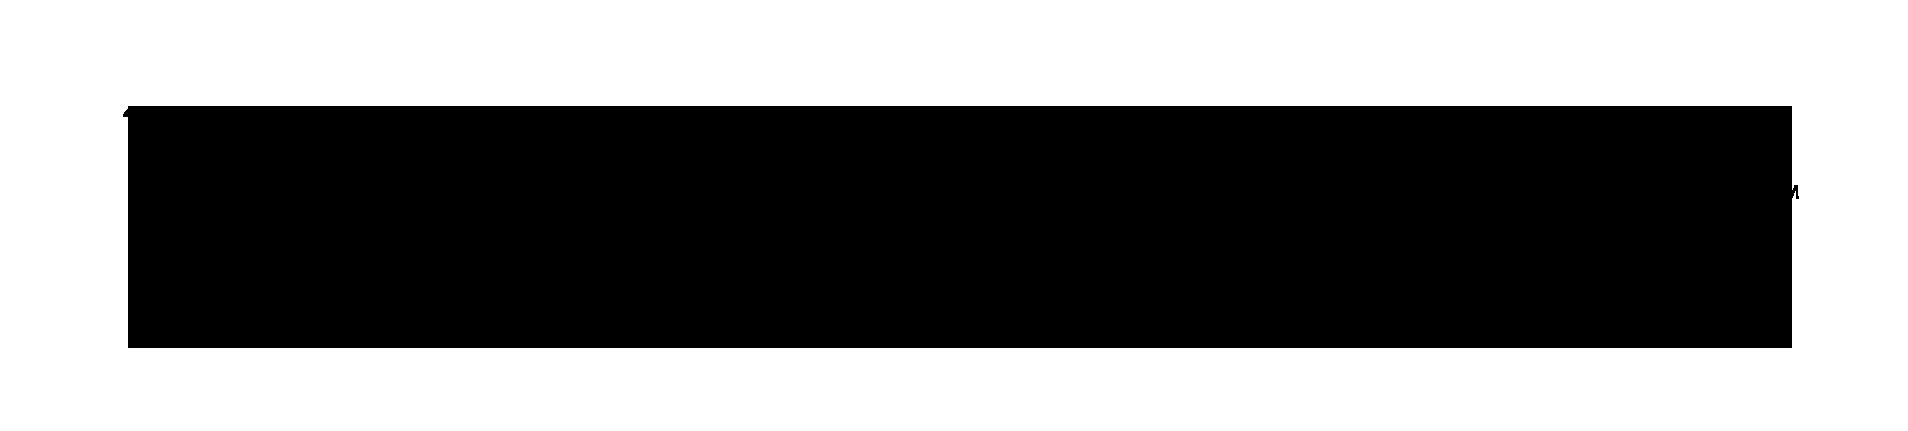 Vigneron Vapory Logo